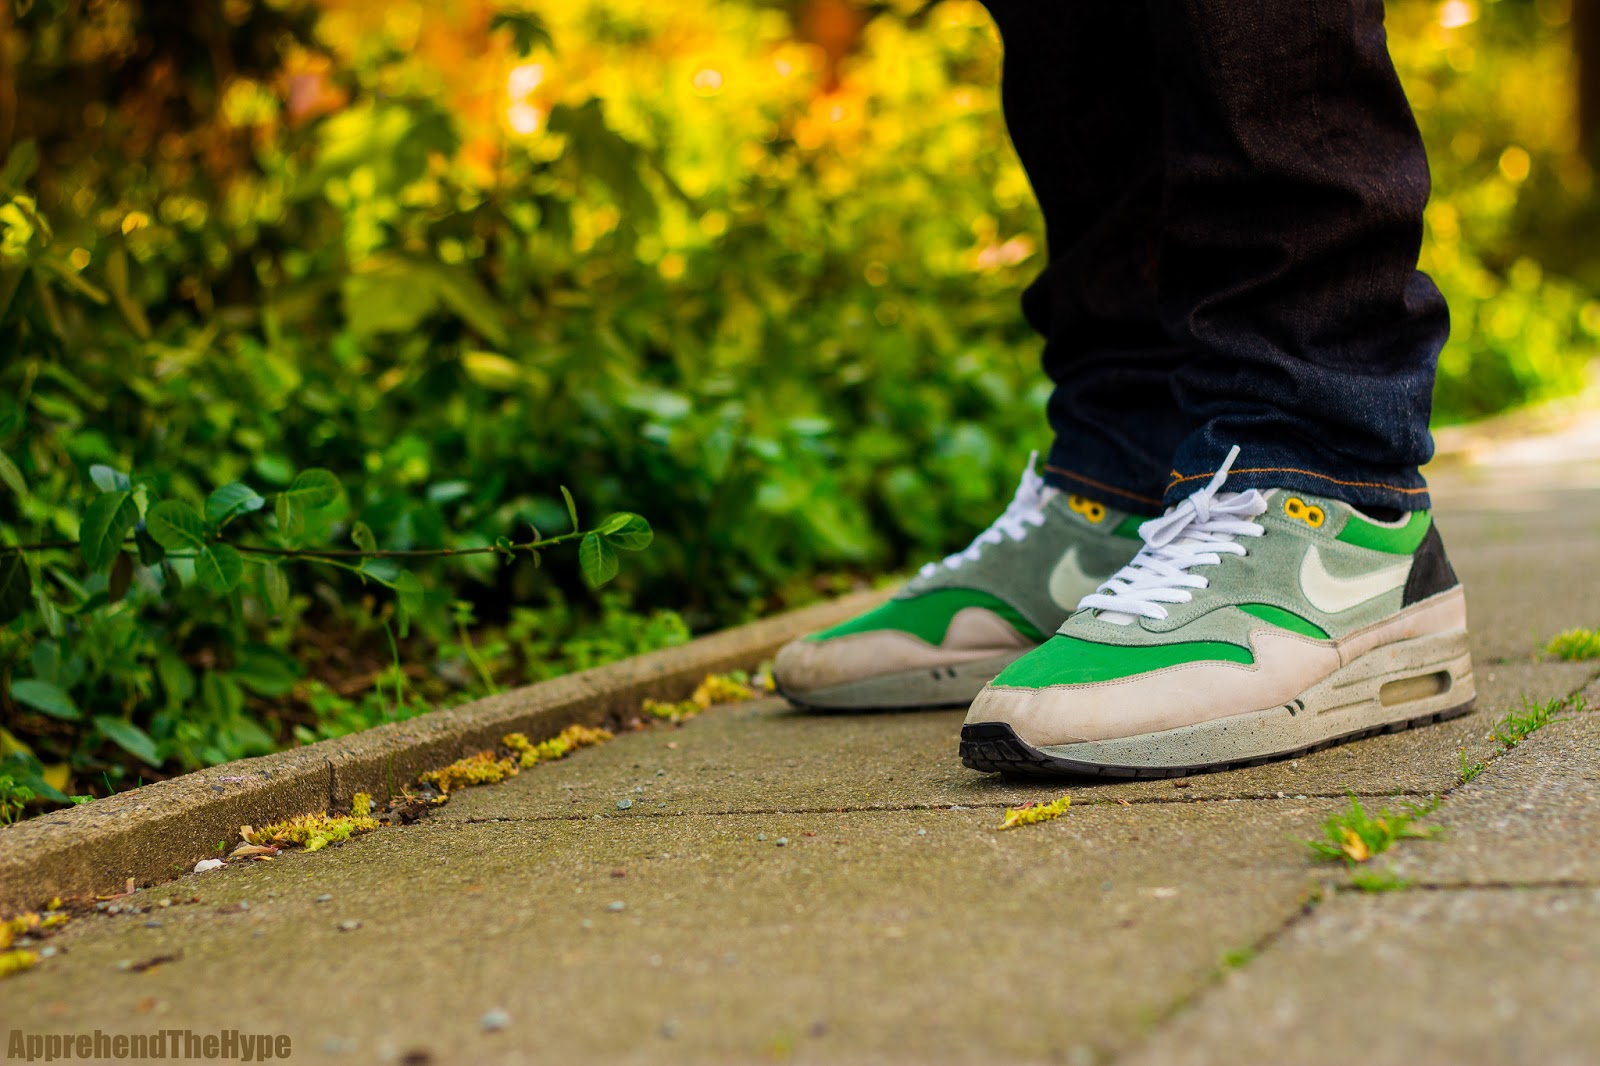 ea6da08656 apprehend the hype: Nike Air Max 1 - Skull Pack / Green